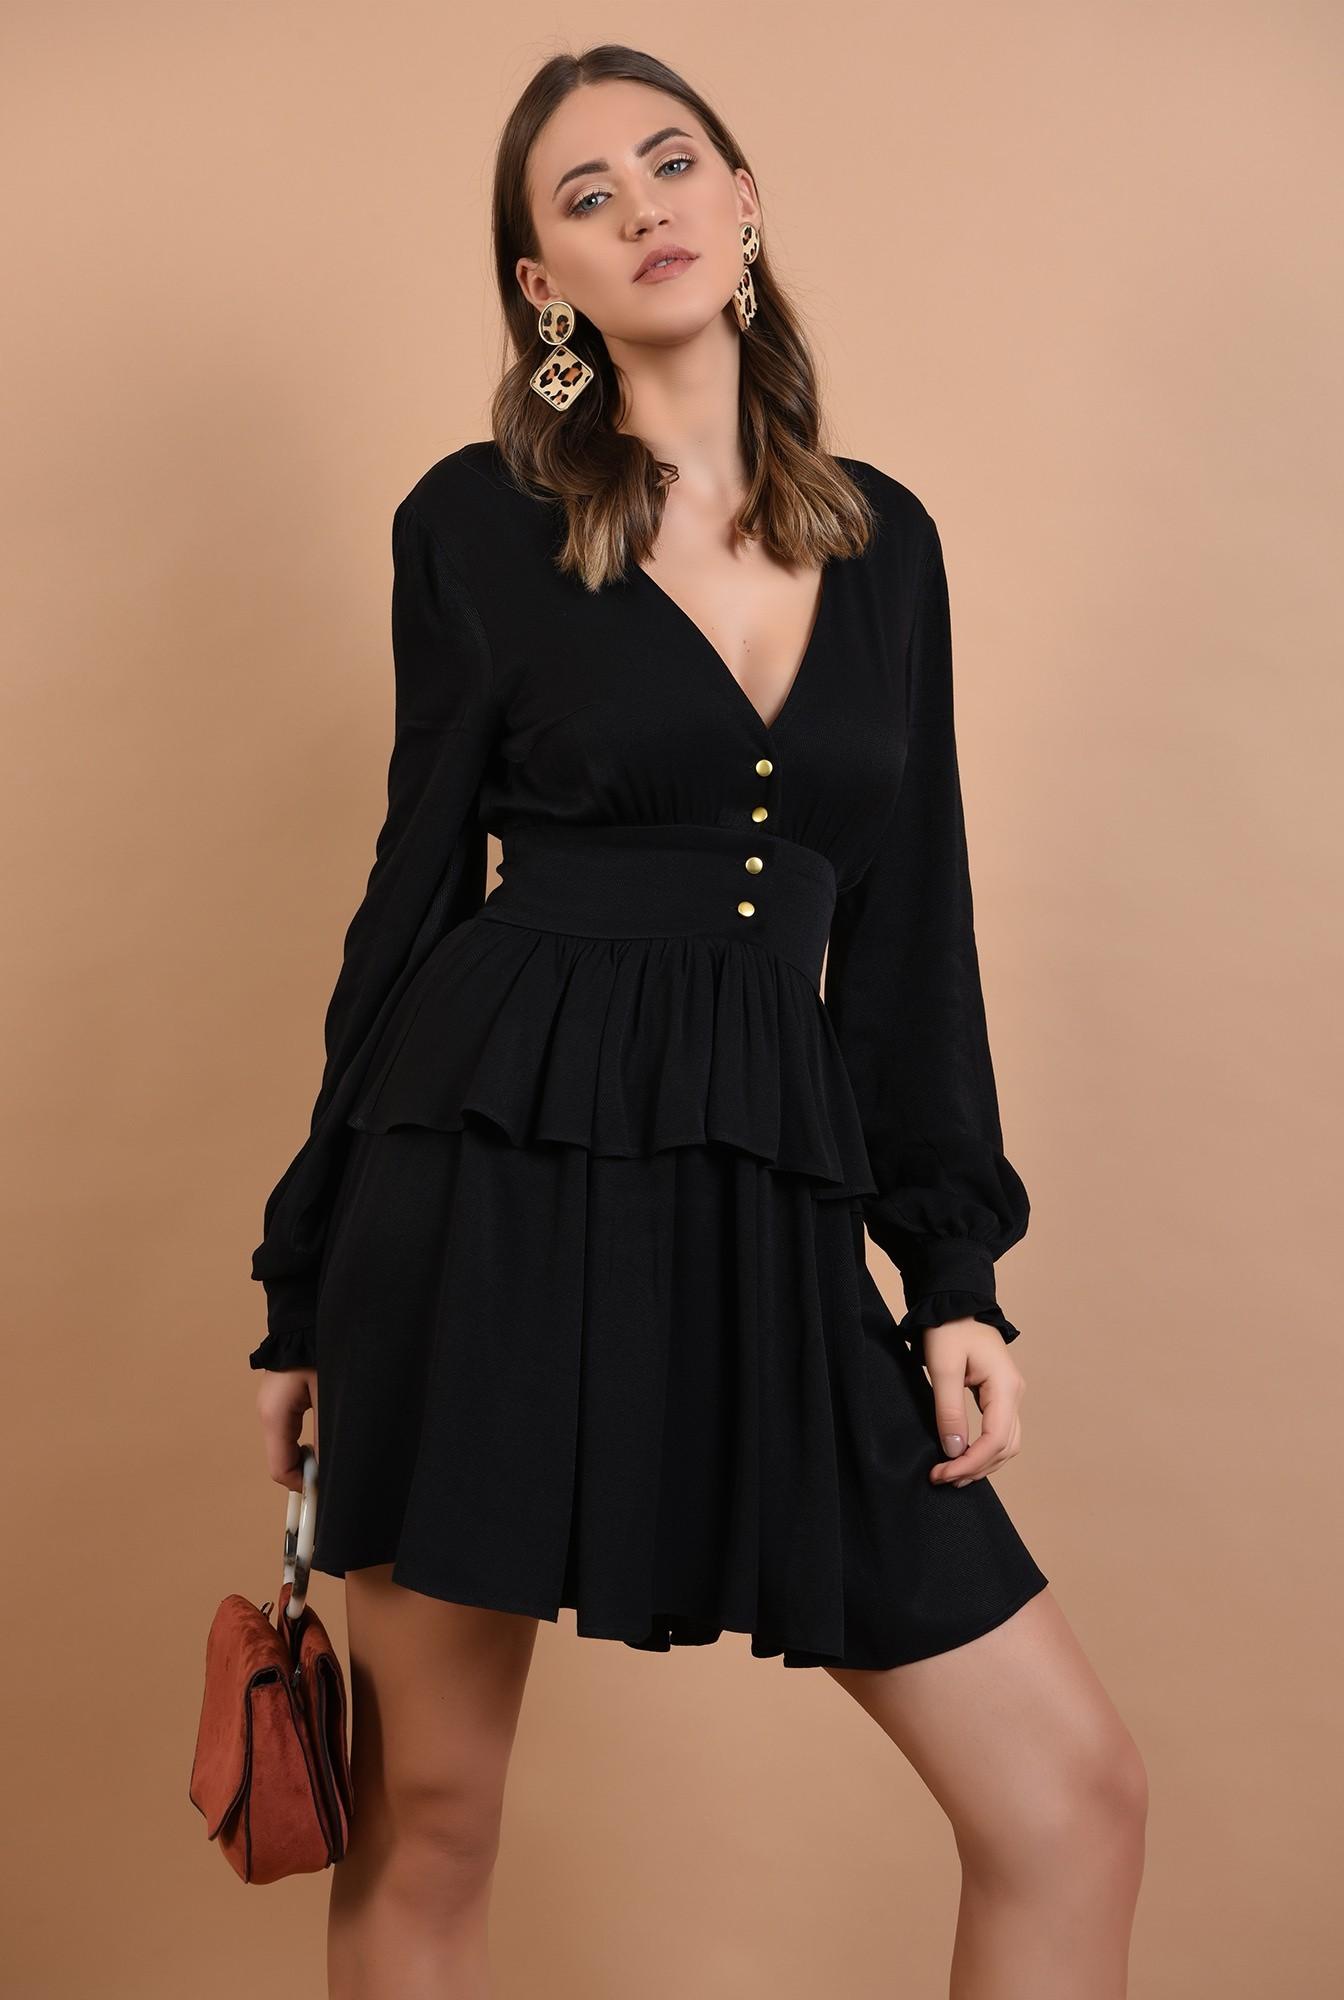 0 - rochie mini, neagra, volan, peplum, nasturi aurii, anchior, Poema